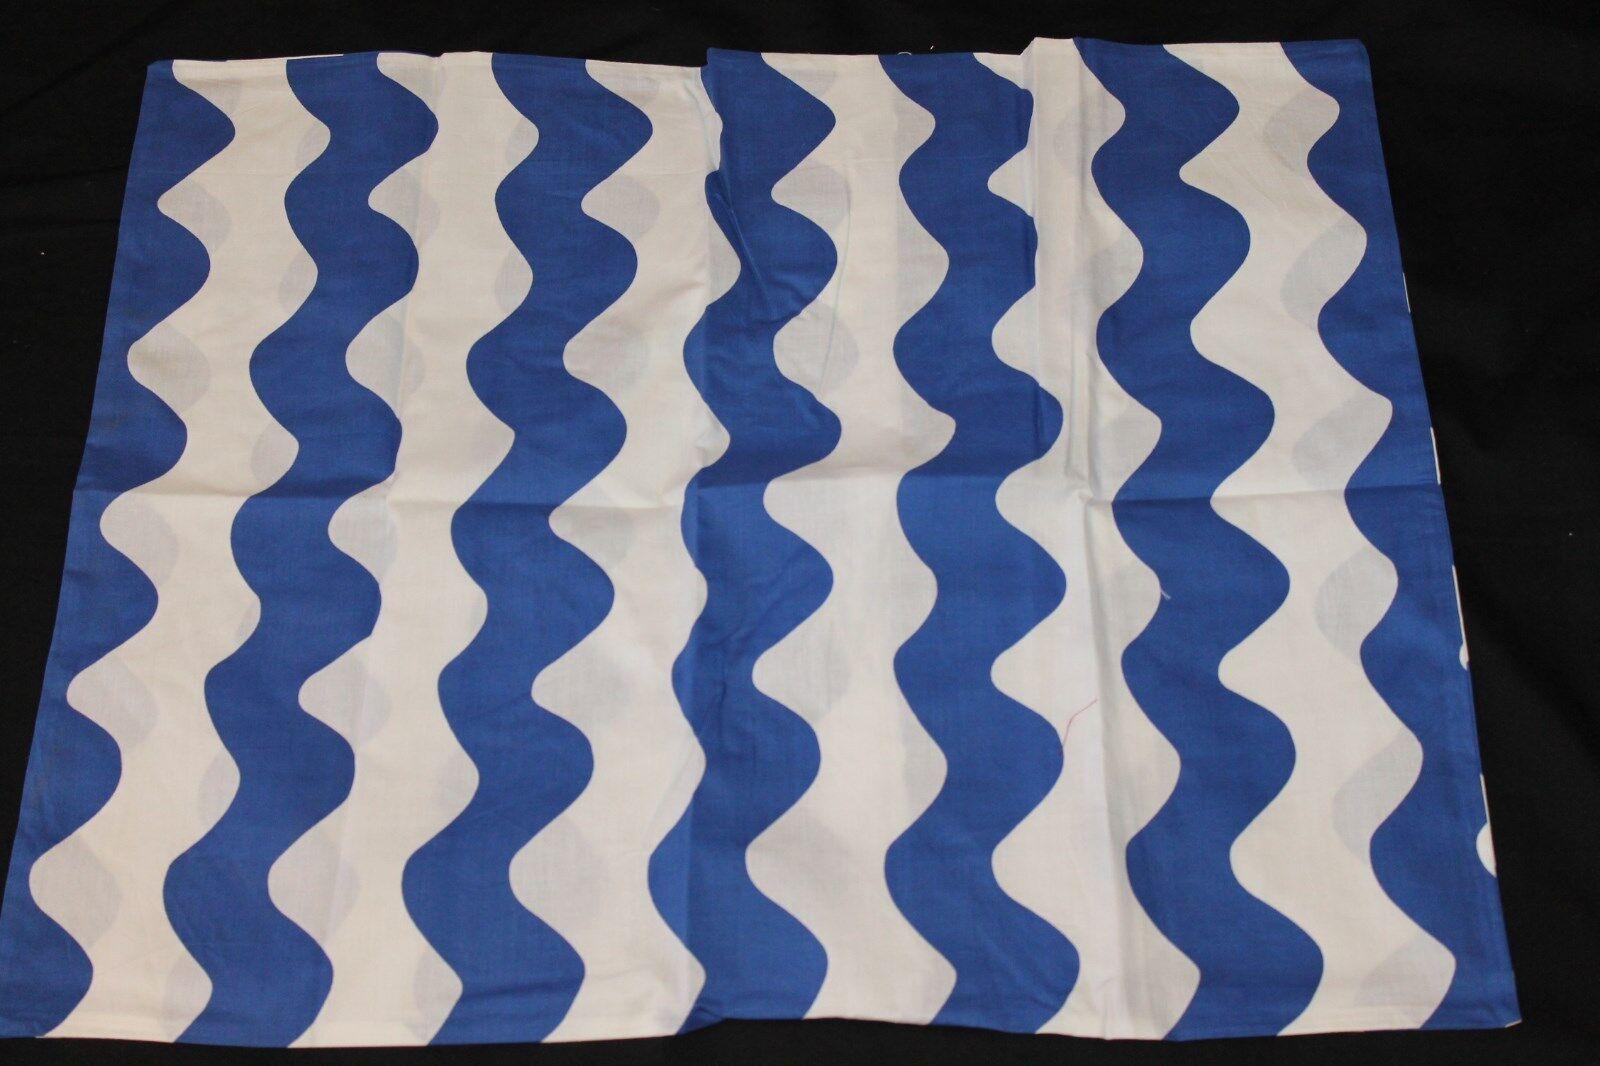 Zig Zag Twin Duvet Set bluee White 2 pc nwop